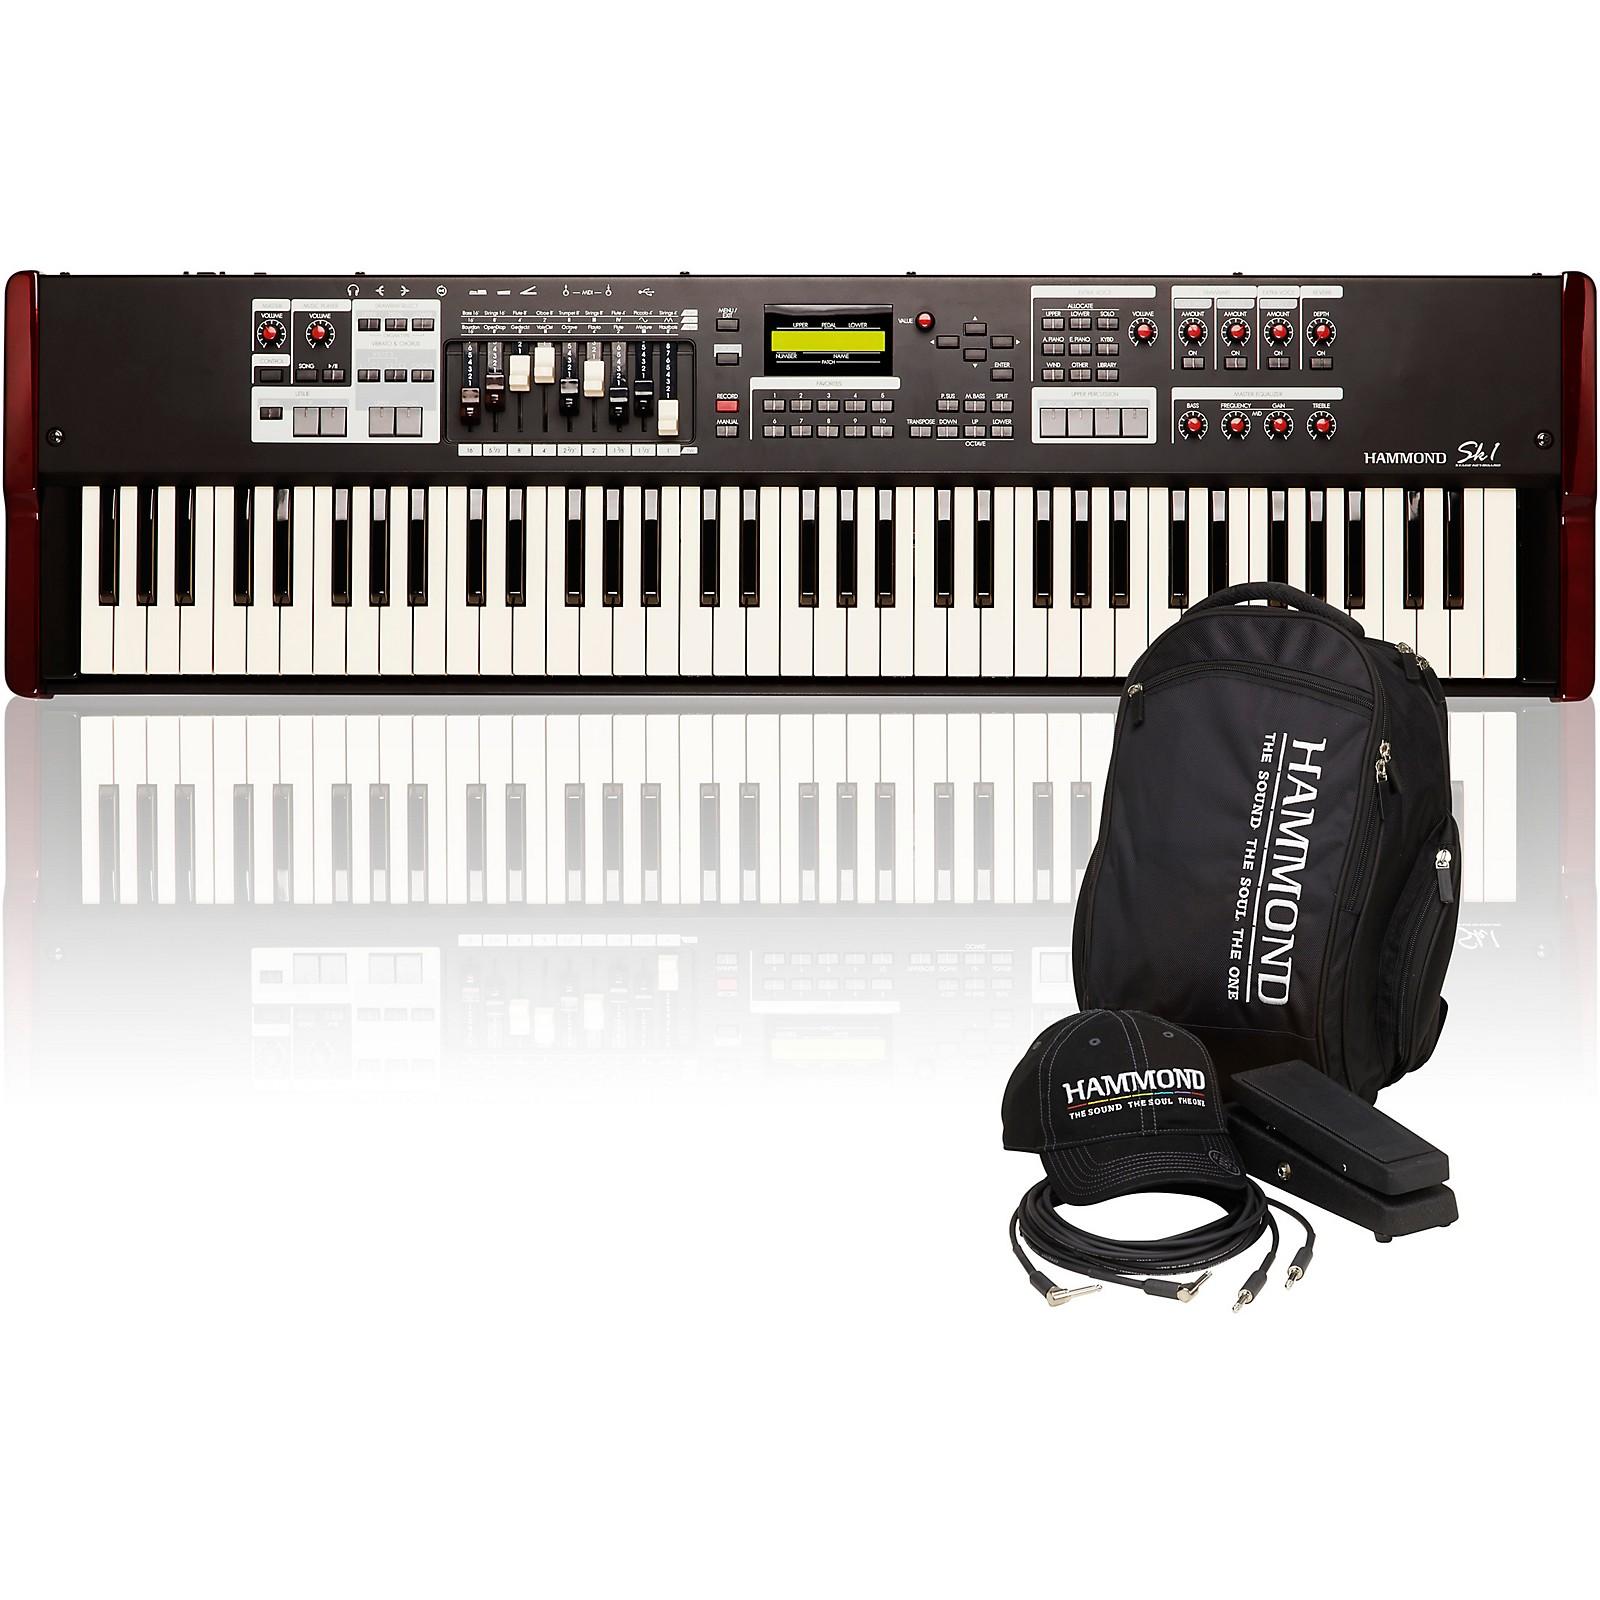 Hammond SK1-73 73 Key Digital Stage Keyboard and Organ with Keyboard Accessory Pack